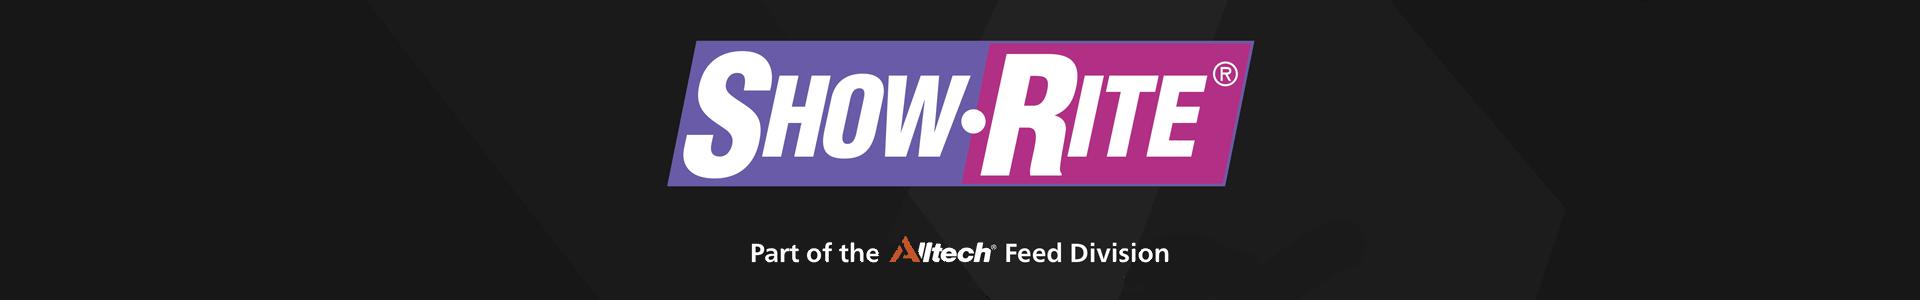 Show-Rite-Webinar-Banner-2